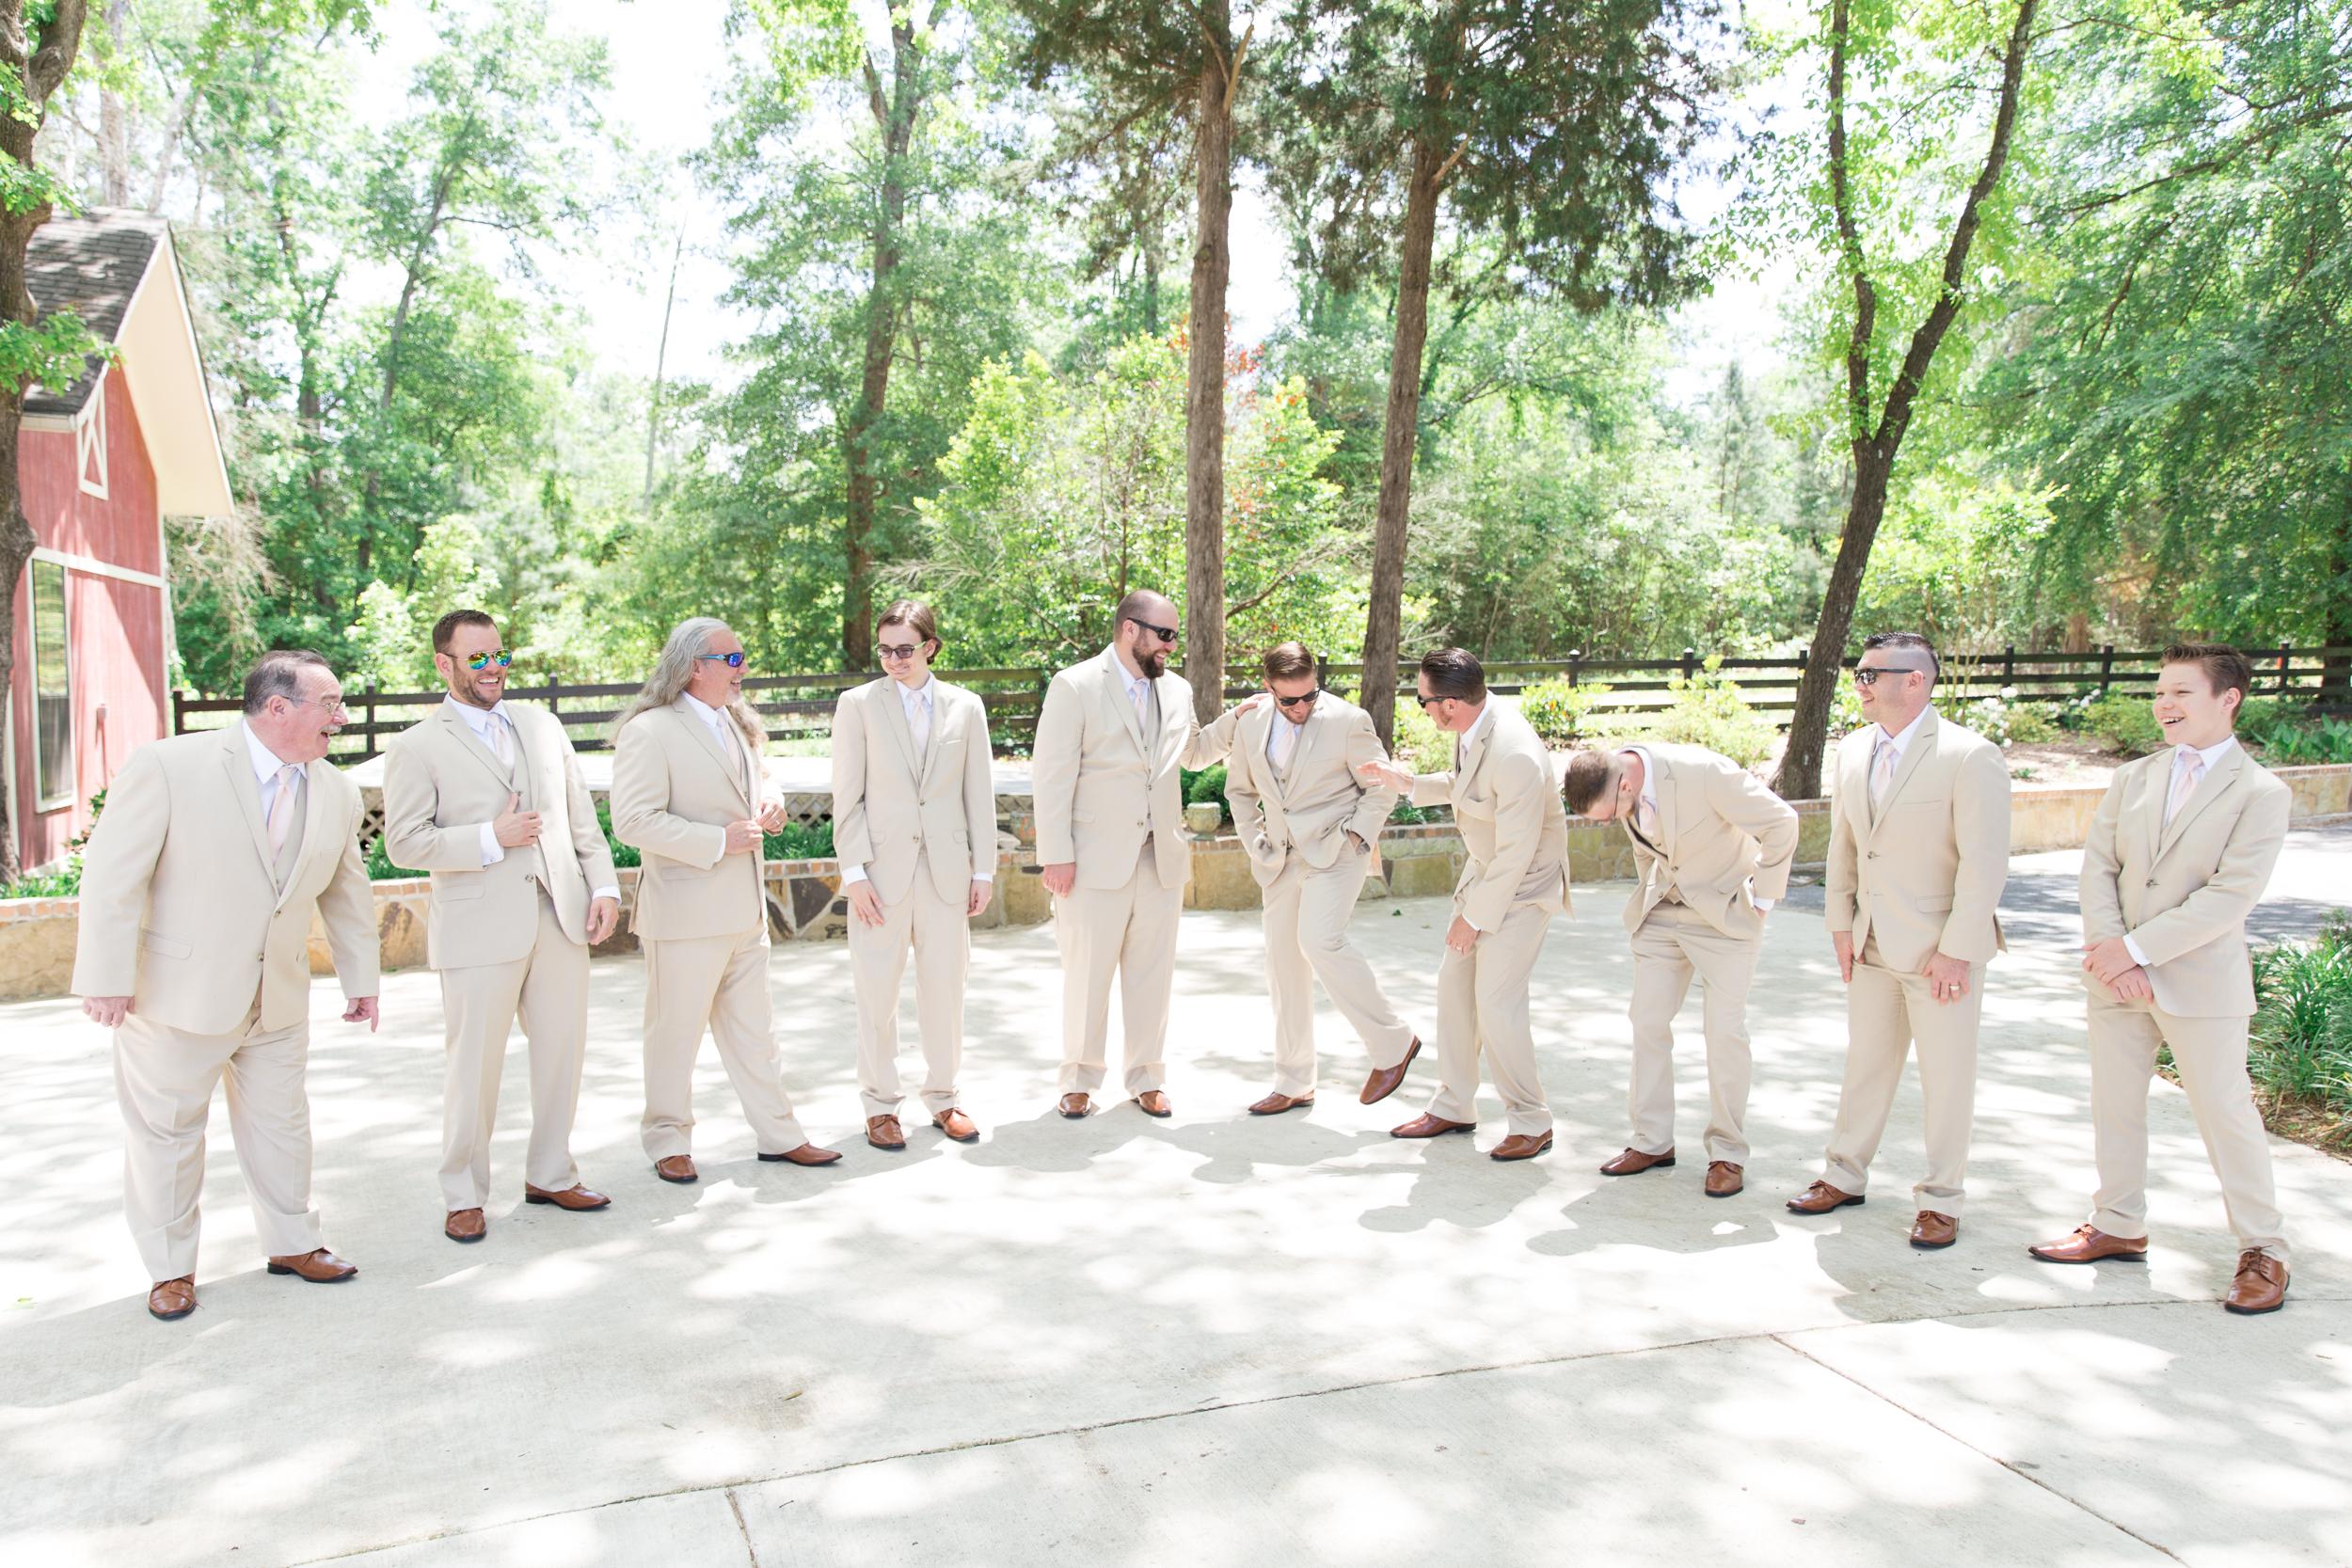 Zihlman-East TX Wedding_Kelsie Hendricks Photography_The Folmar Tyler Texas-15.jpg